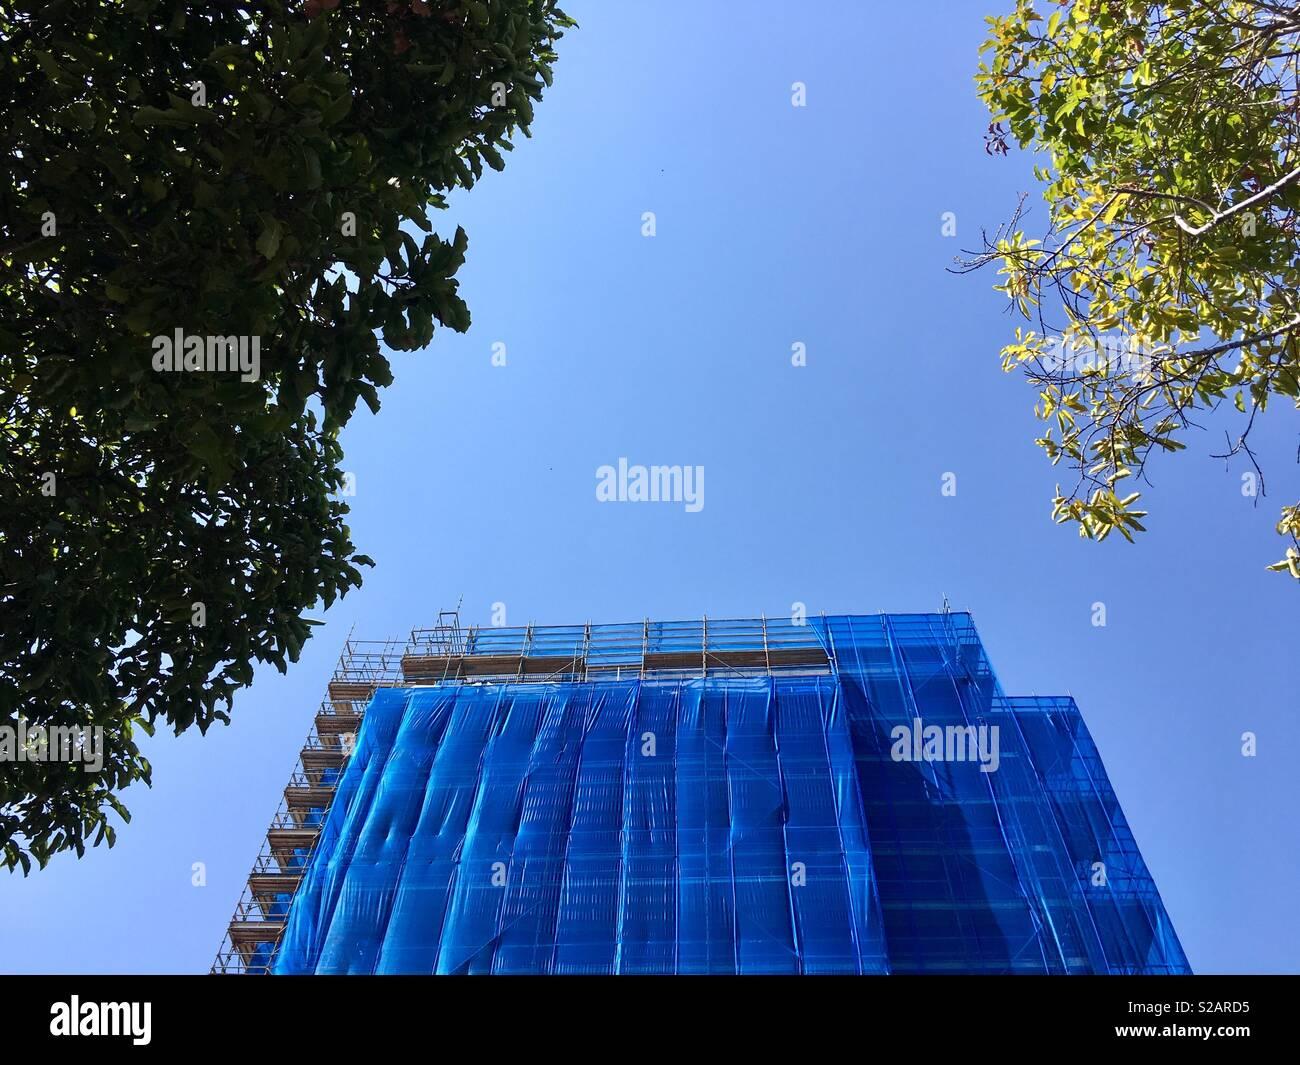 Edificio cubierto de andamios azul contra un cielo azul visto entre dos árboles. Imagen De Stock